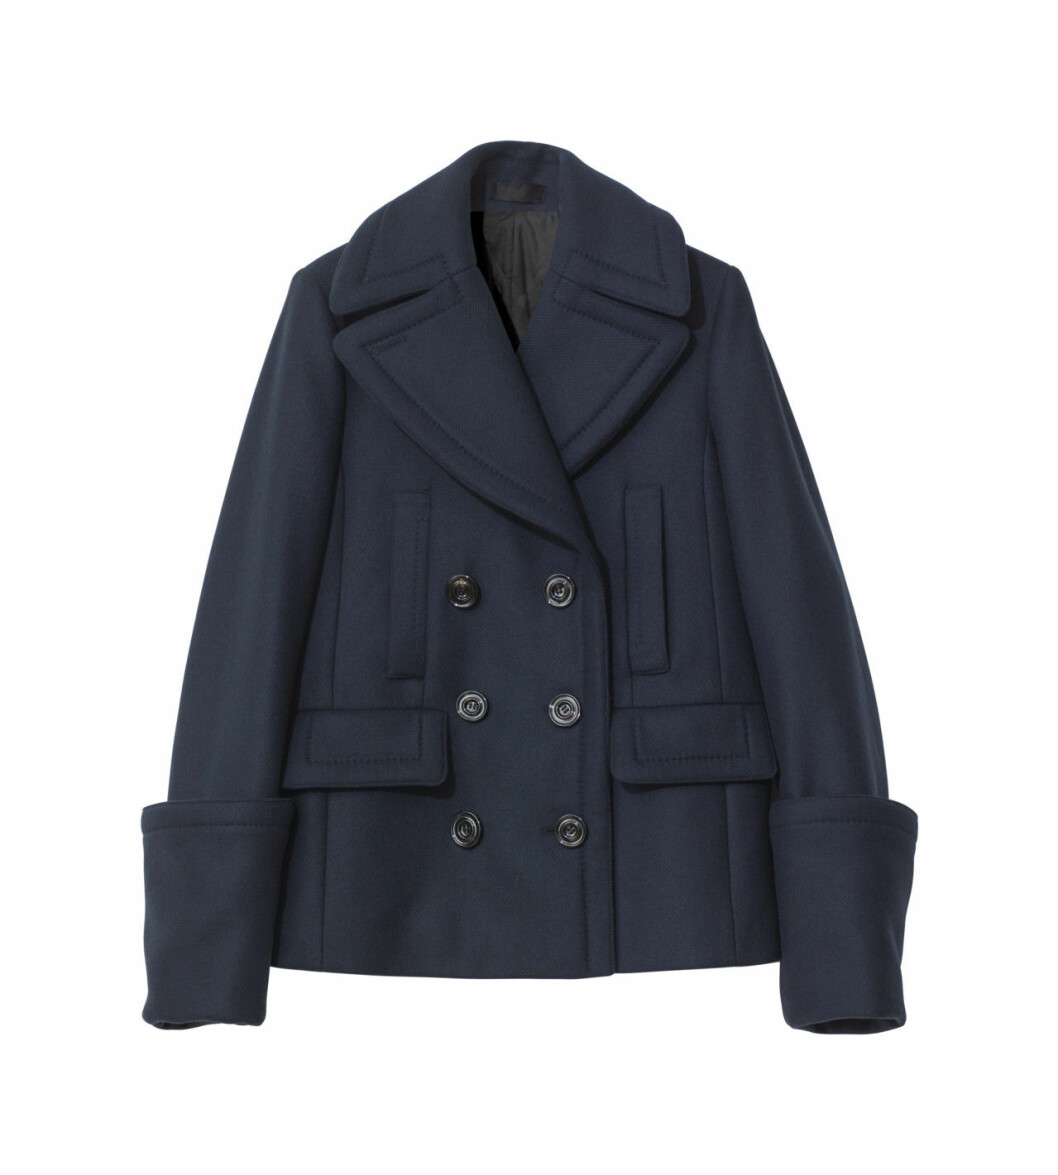 H&M Studio höstkollektion 2018